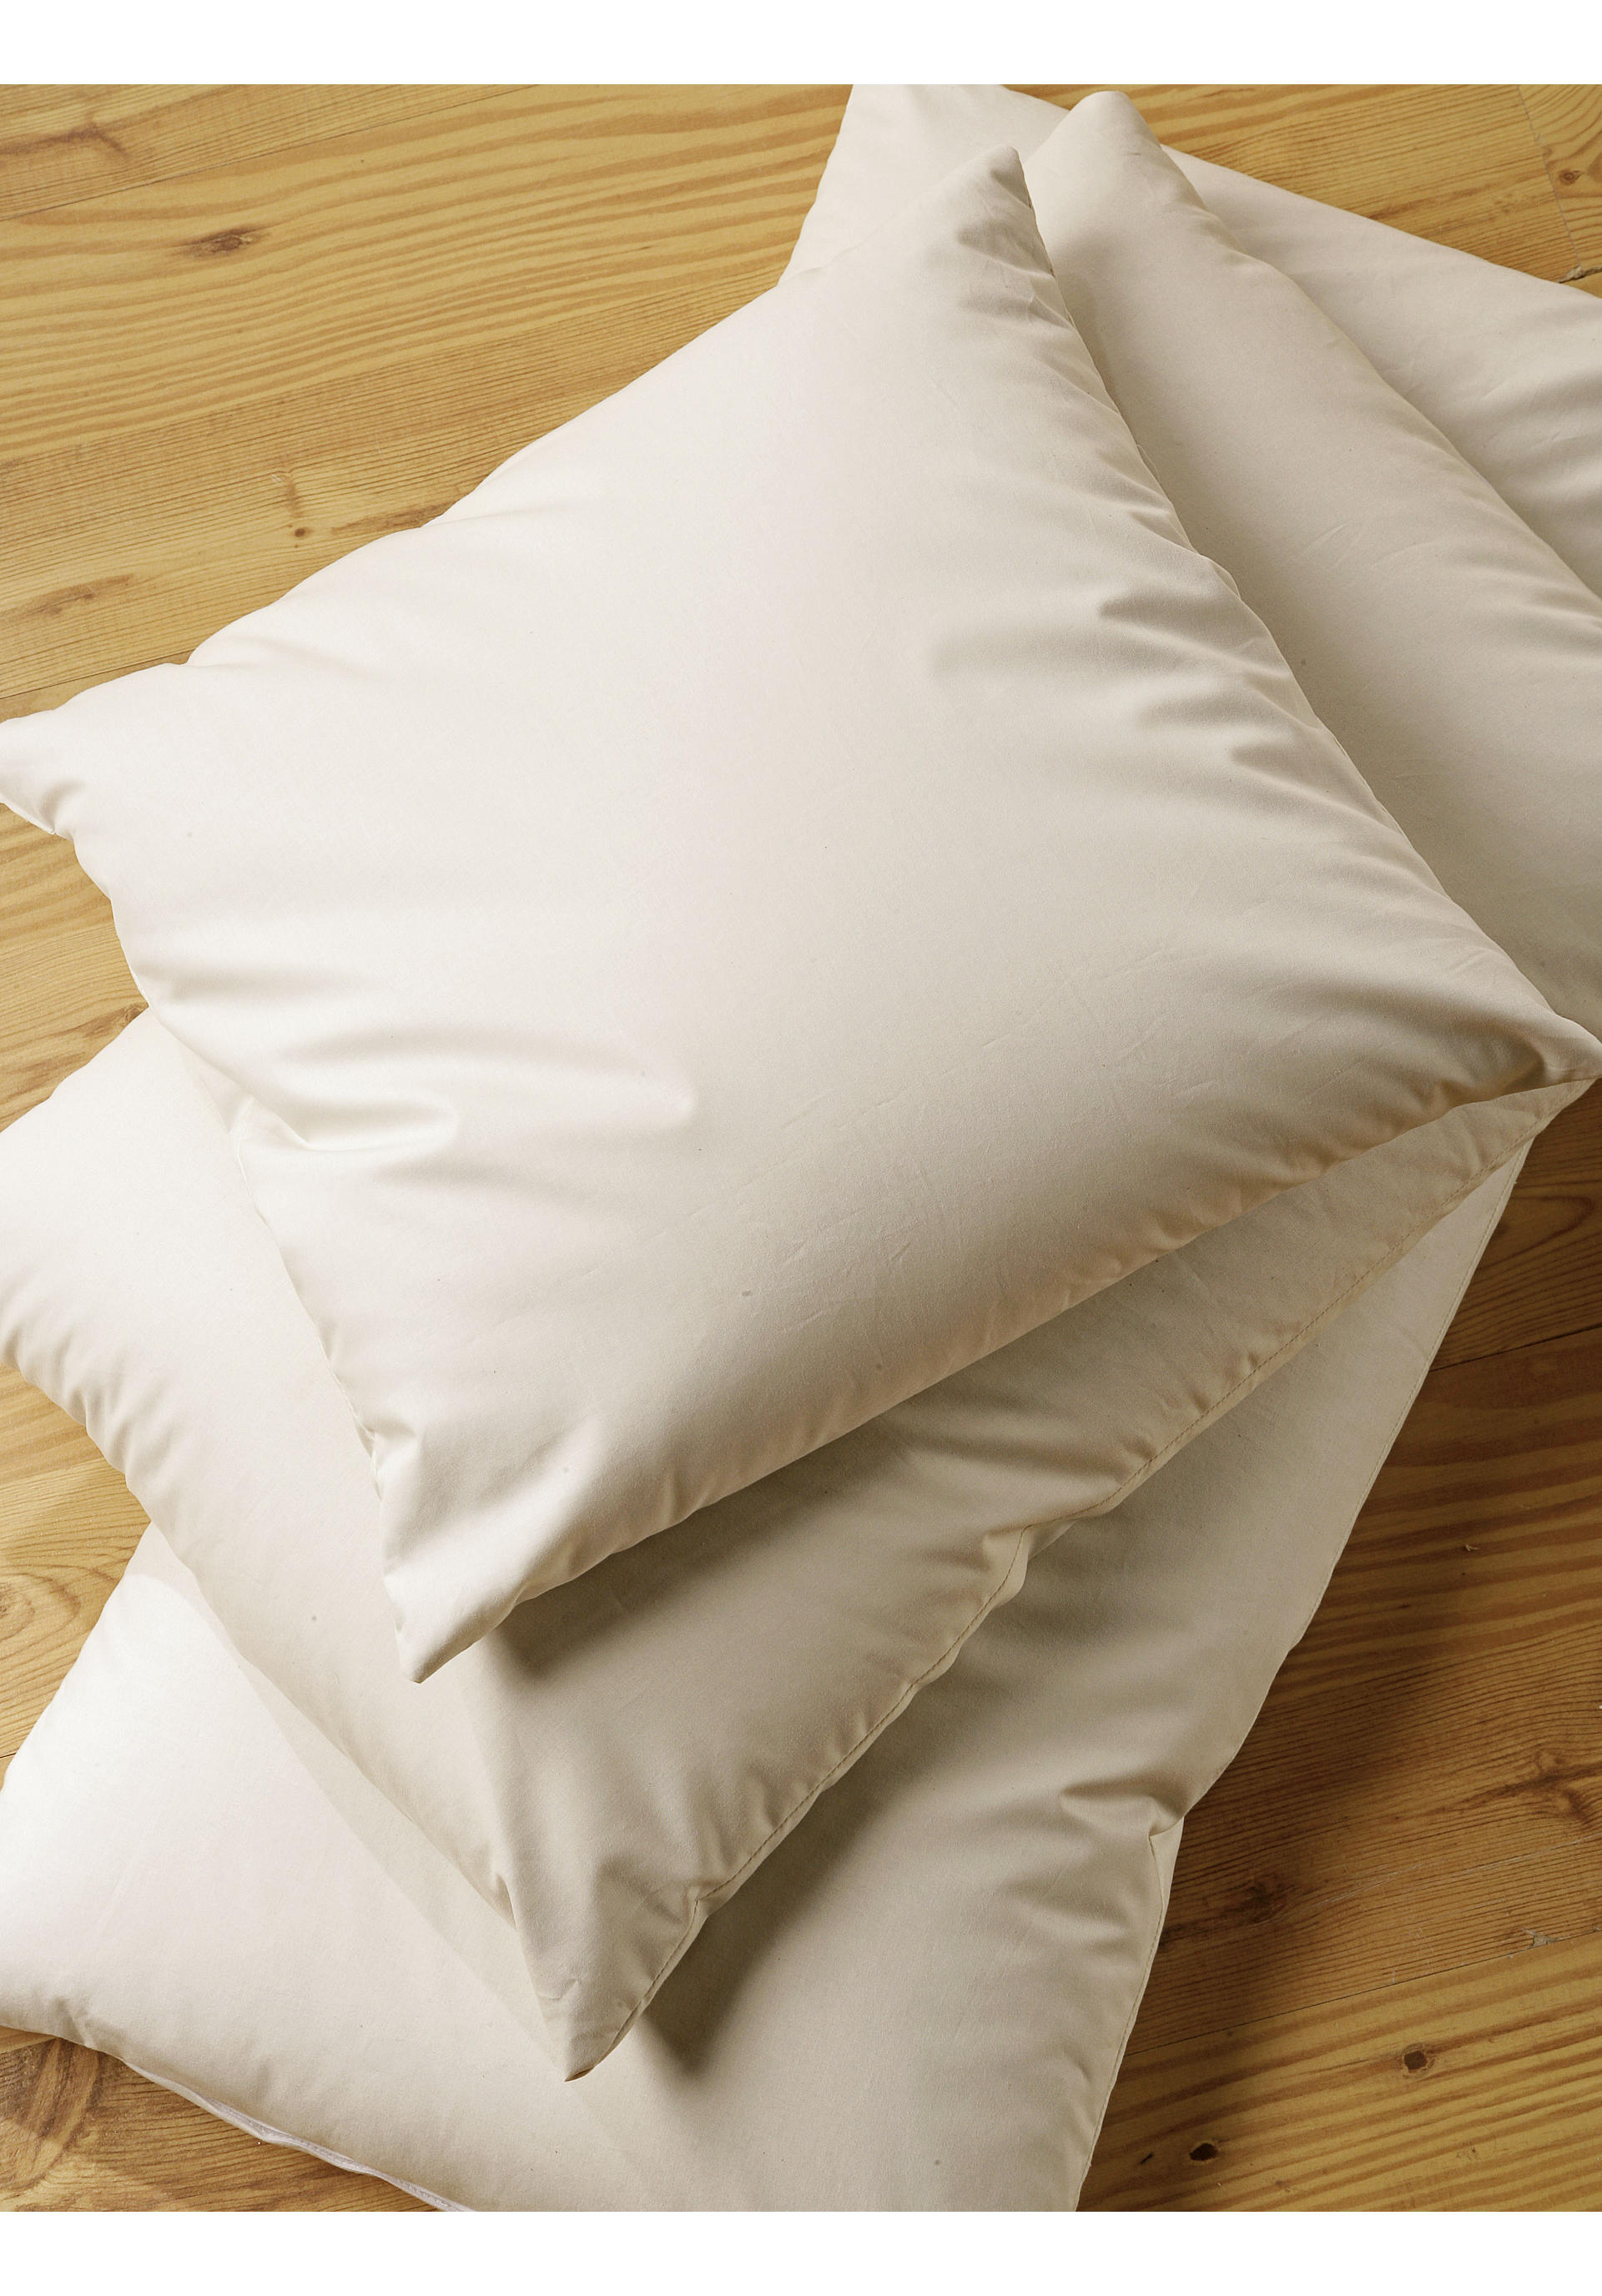 dinkelspelz kissen hessnatur deutschland. Black Bedroom Furniture Sets. Home Design Ideas